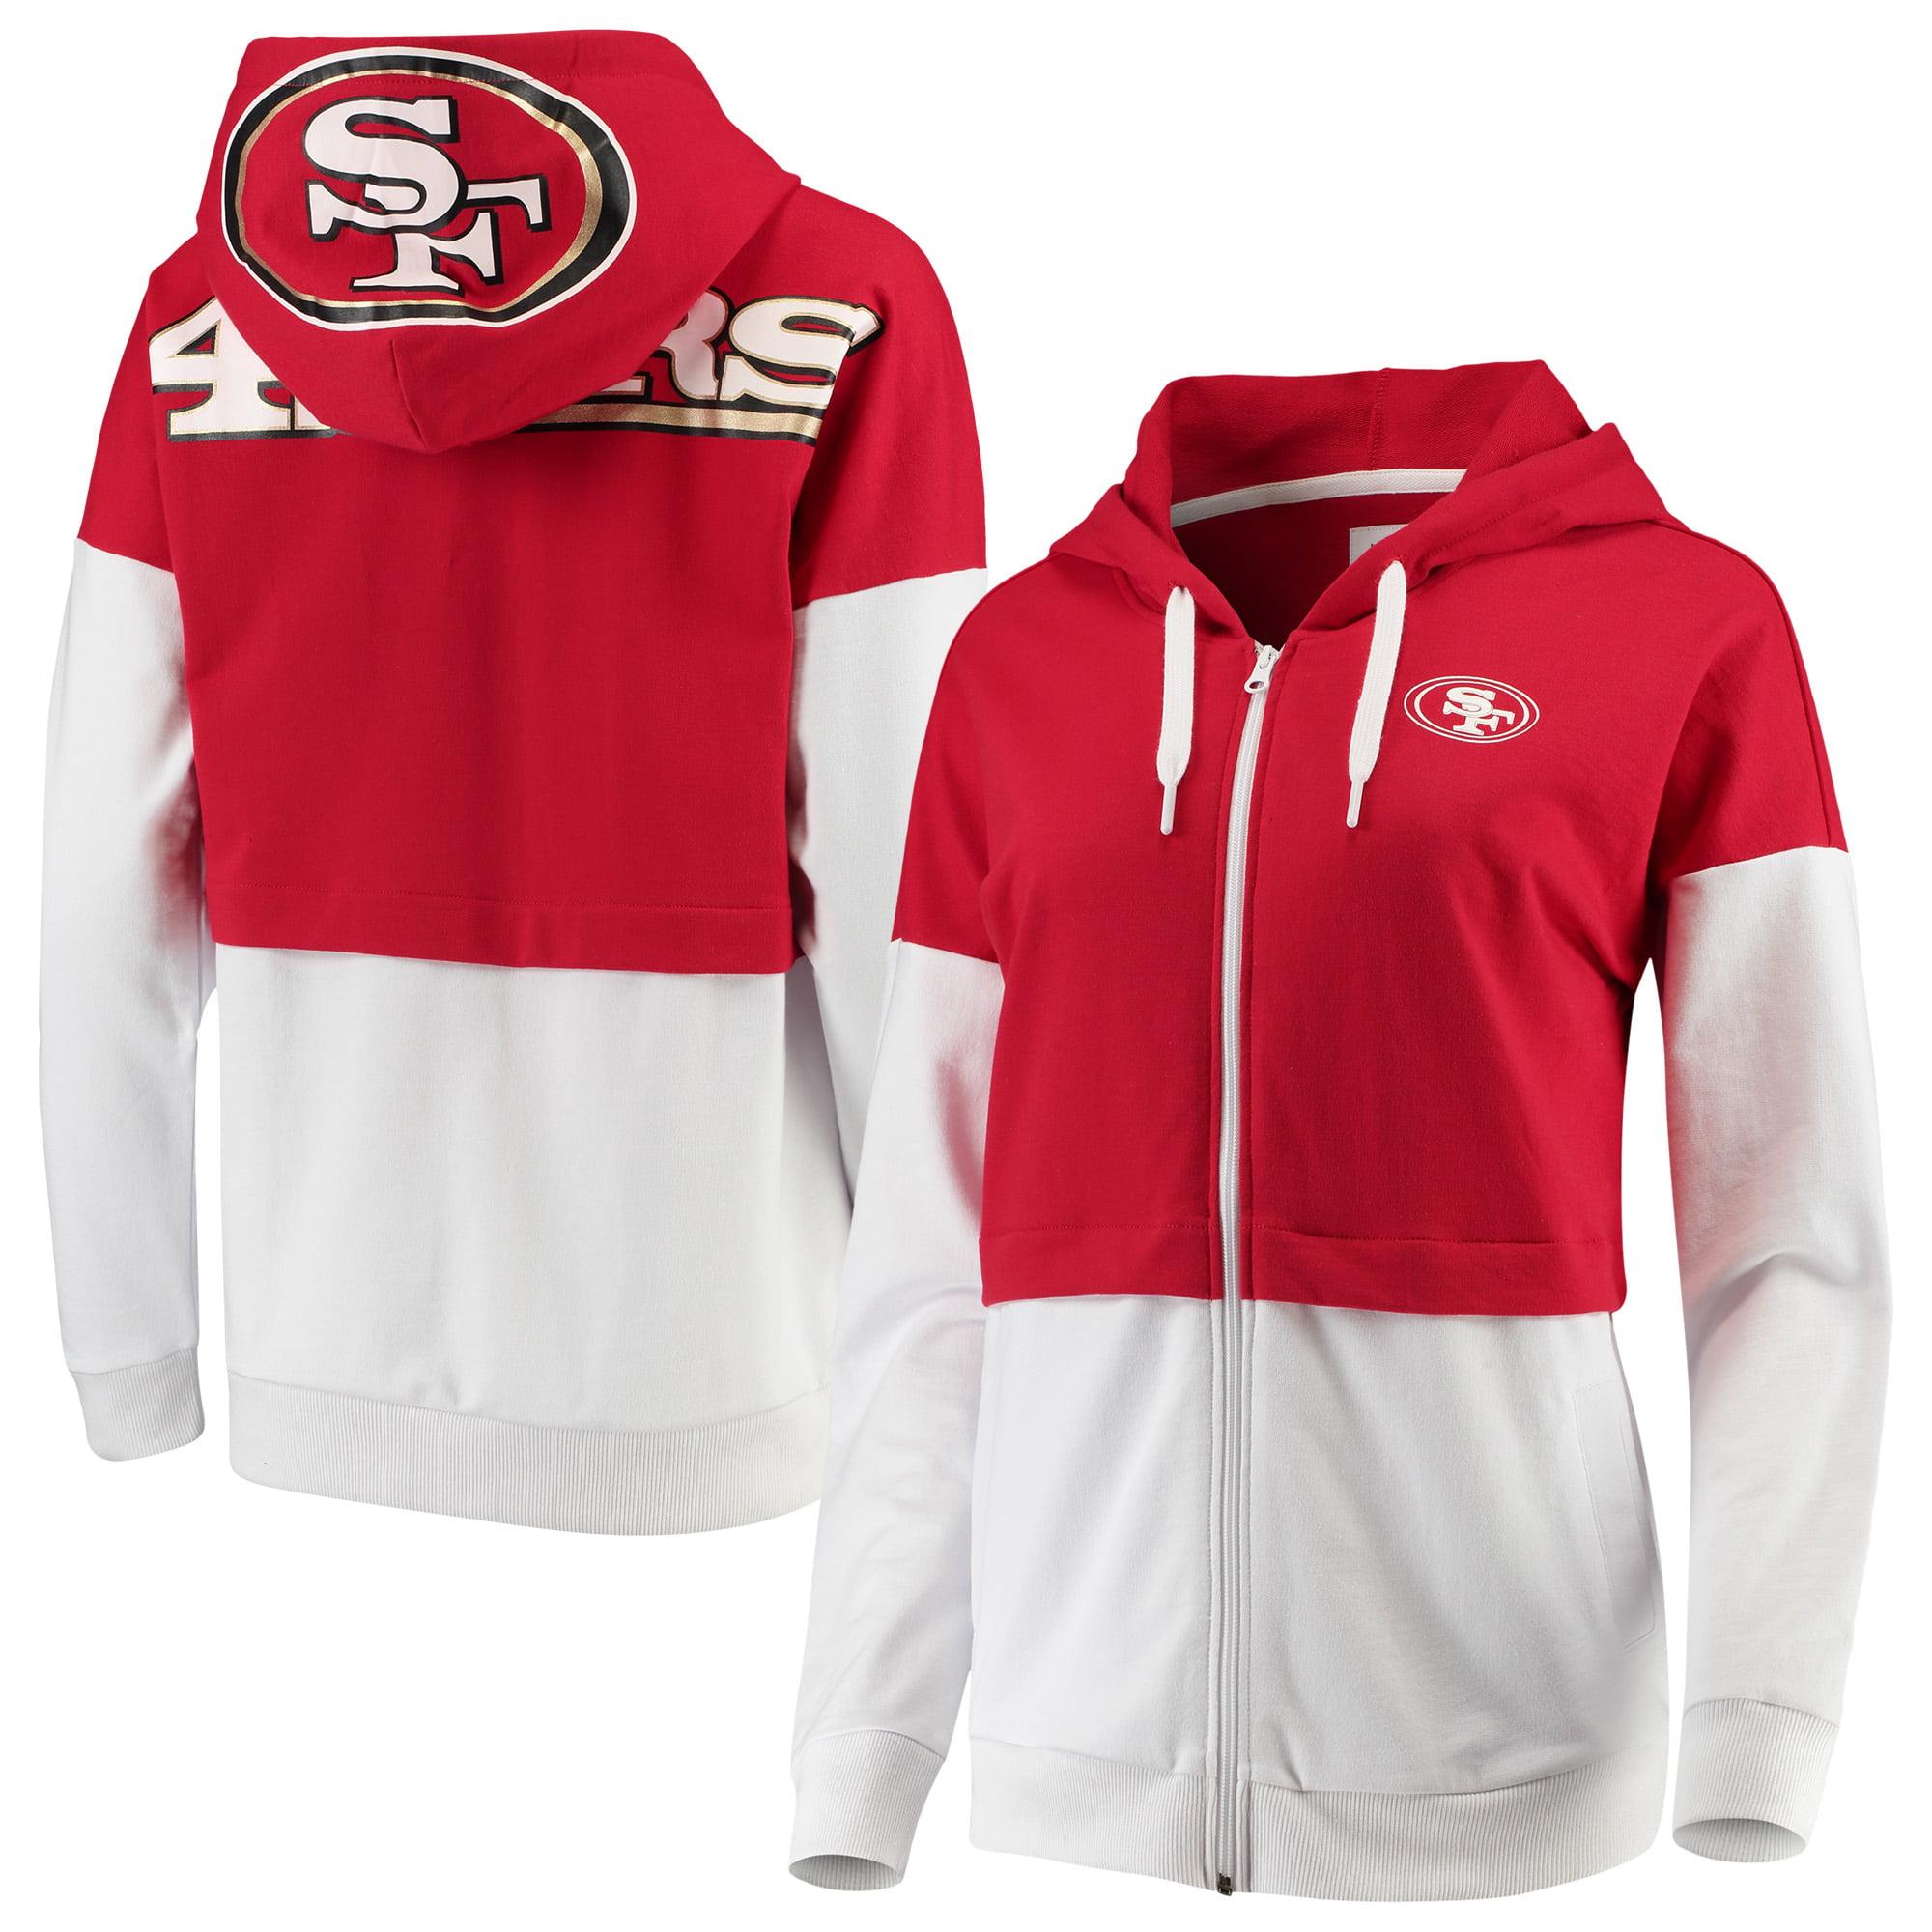 San Francisco 49ers G-III 4Her by Carl Banks Women's Game Changer Full-Zip Hoodie - Scarlet/White